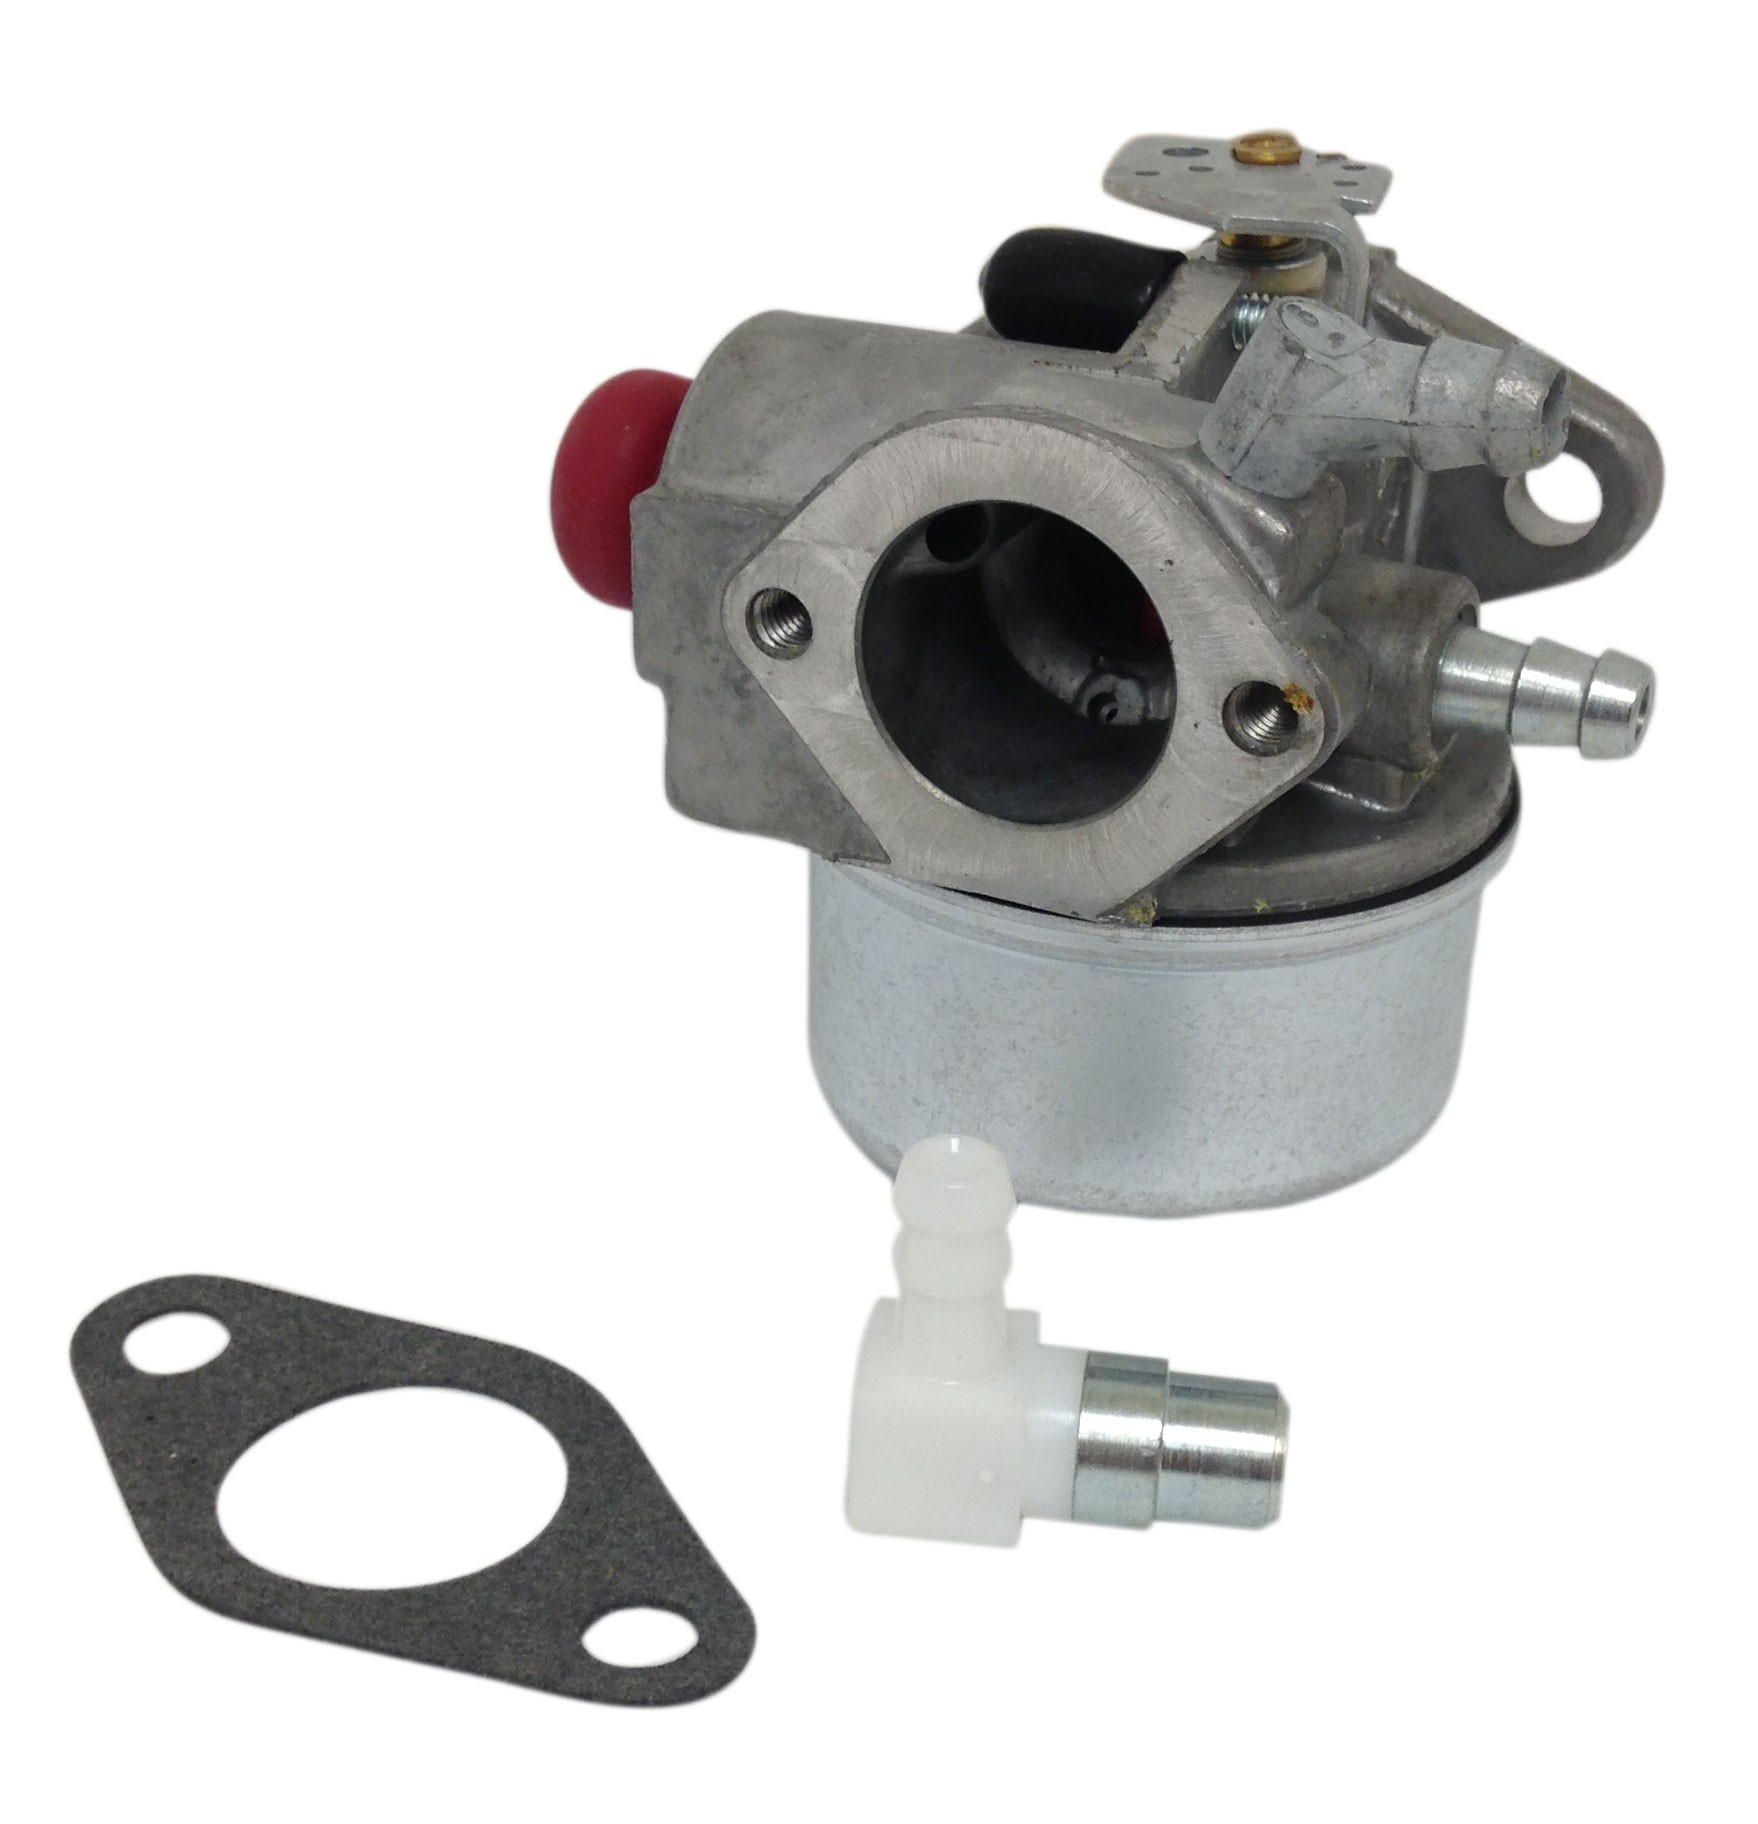 Tecumseh 6 5 Hp Engine Diagram 5hp Carburetor B My Wiring Ohv Specs Diagrams